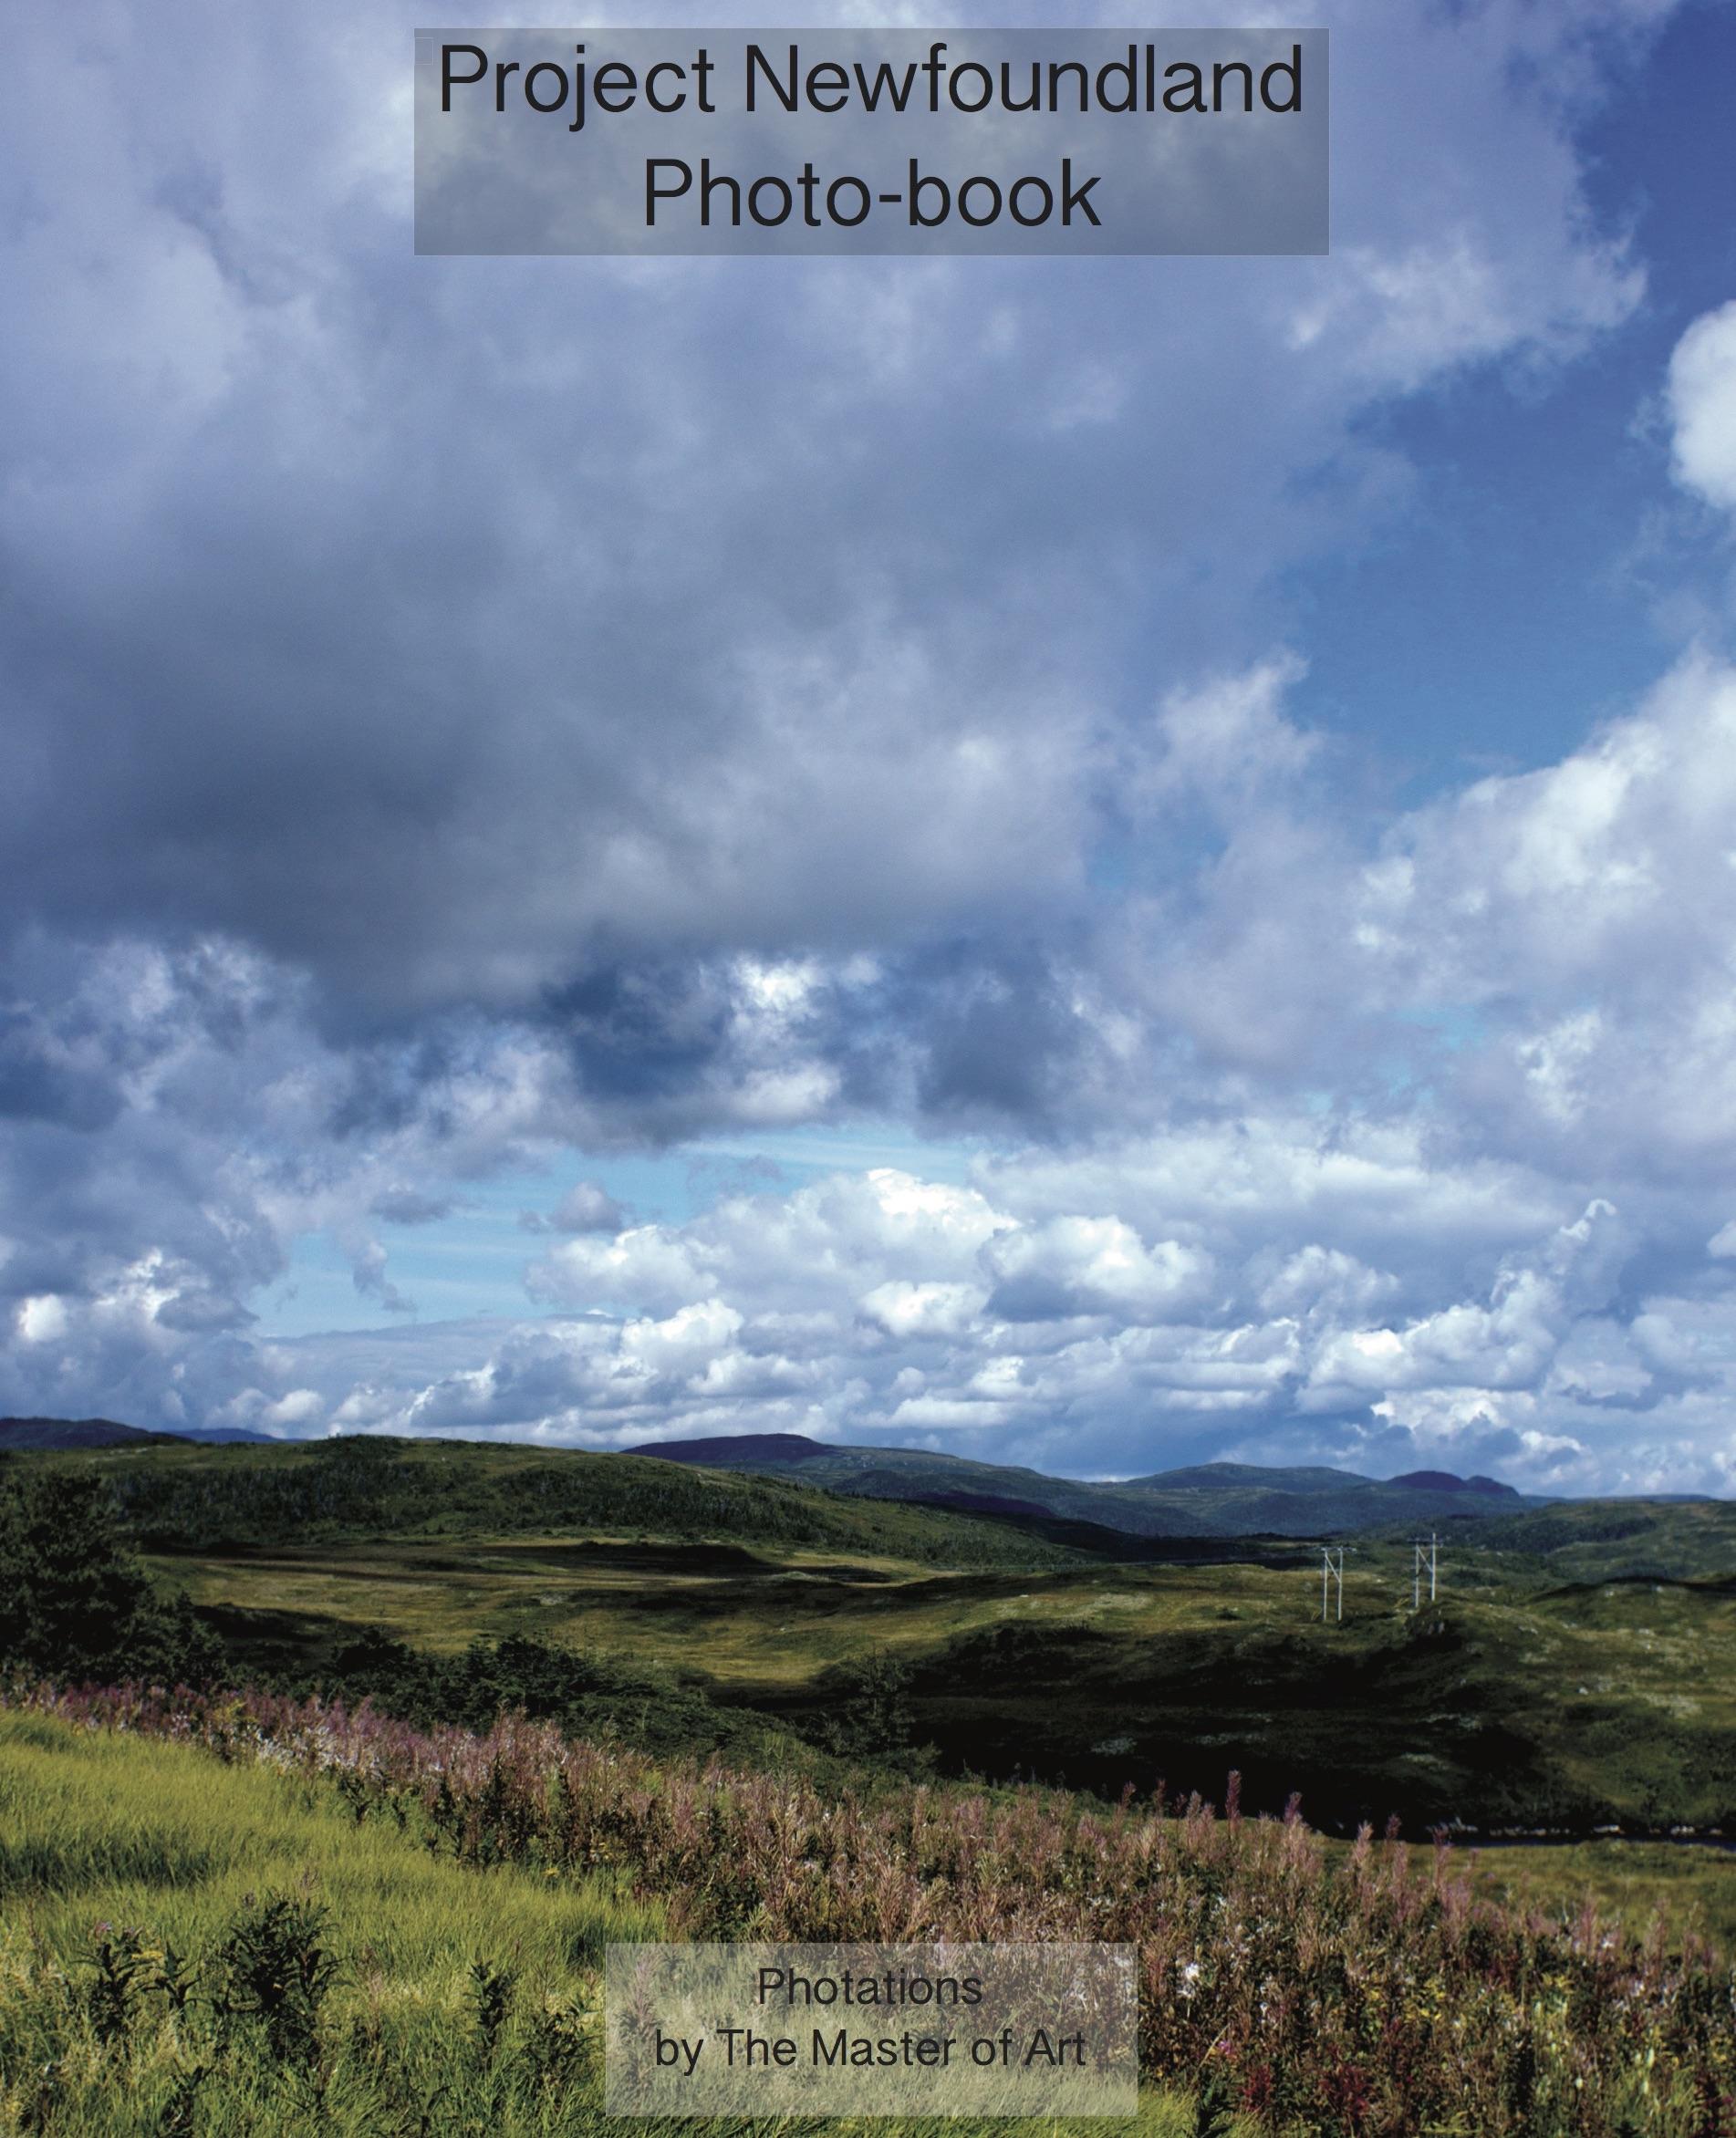 Project Newfoundland Photobook Cover.jpg